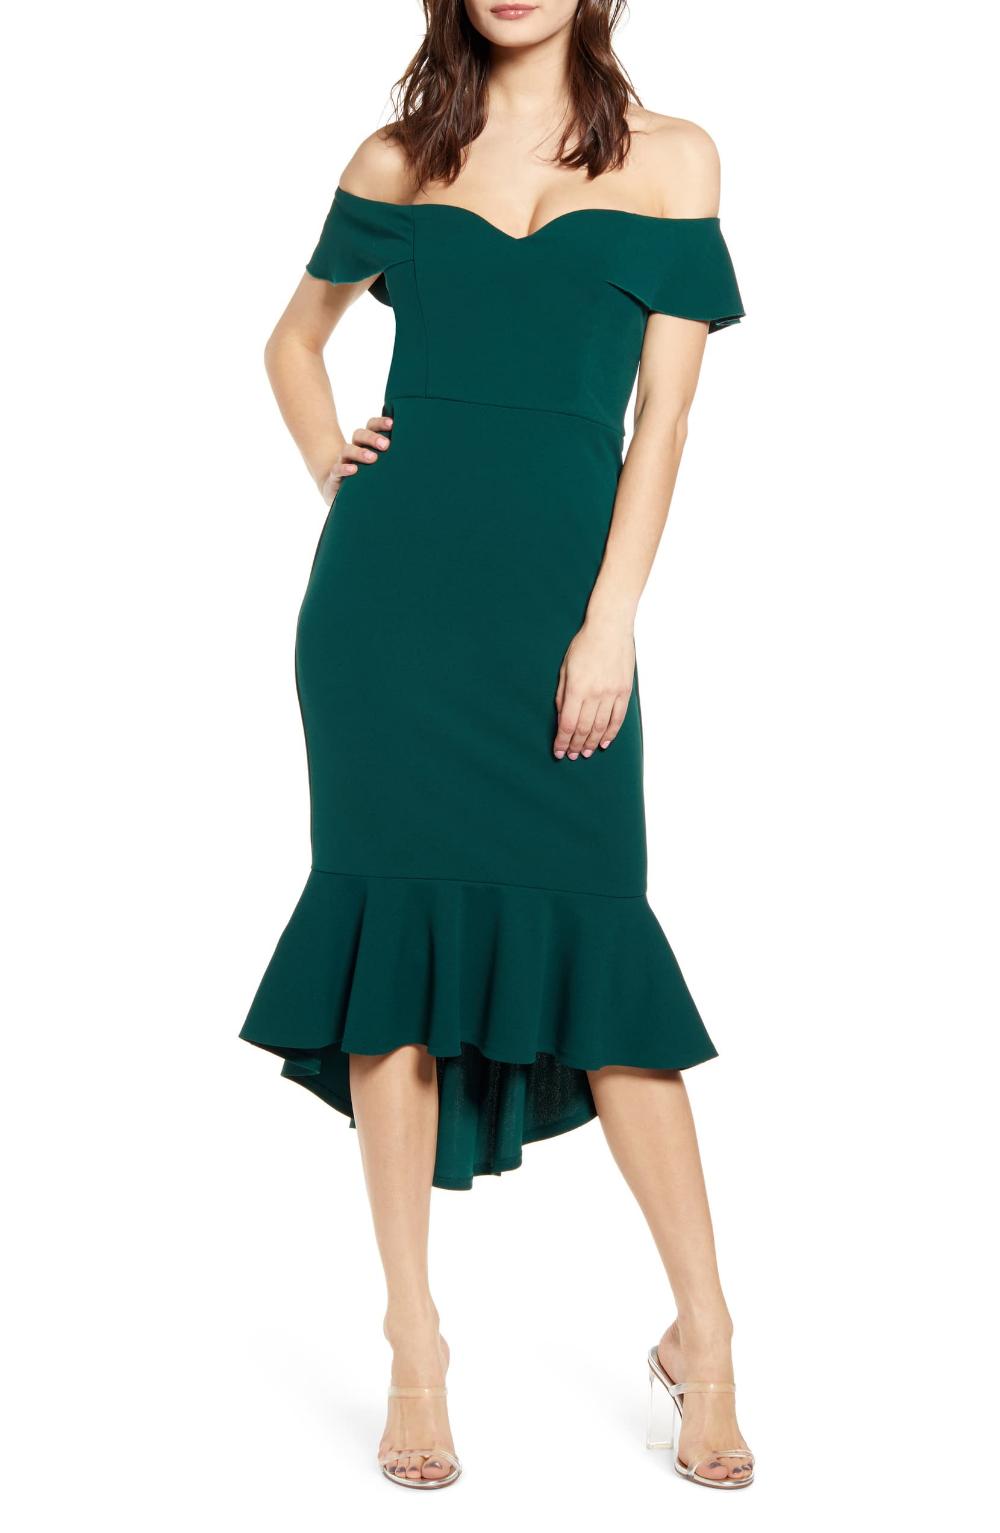 Love Nickie Lew Sweetheart Midi Dress Nordstrom Dresses Green Midi Dress Fashion Clothes Women [ 1533 x 1000 Pixel ]